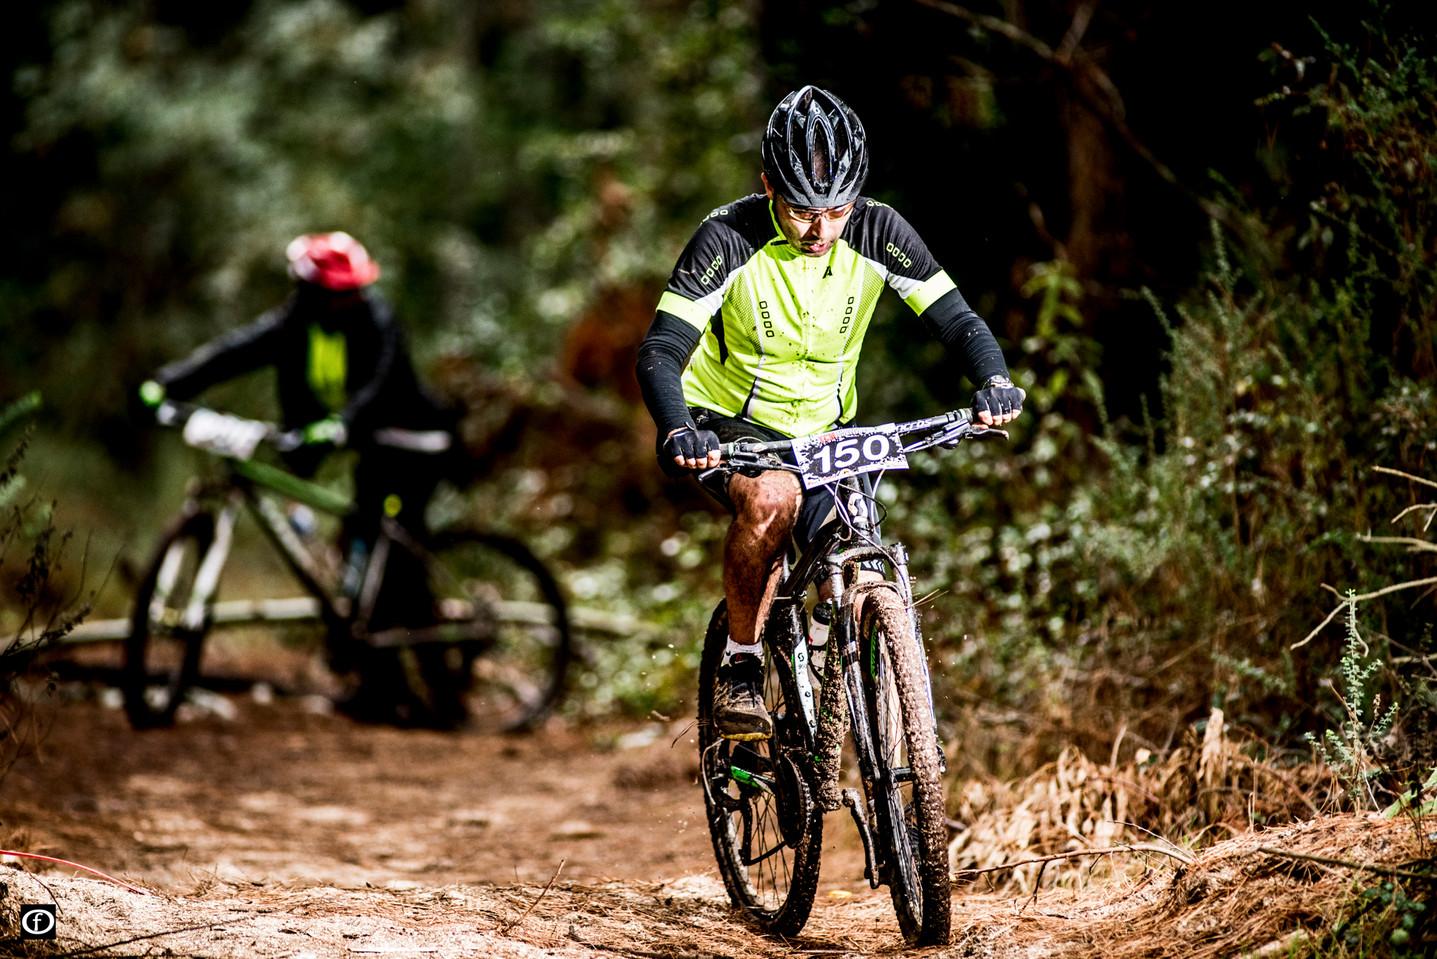 2015-05-17-Ciclismo Enduro-71.jpg